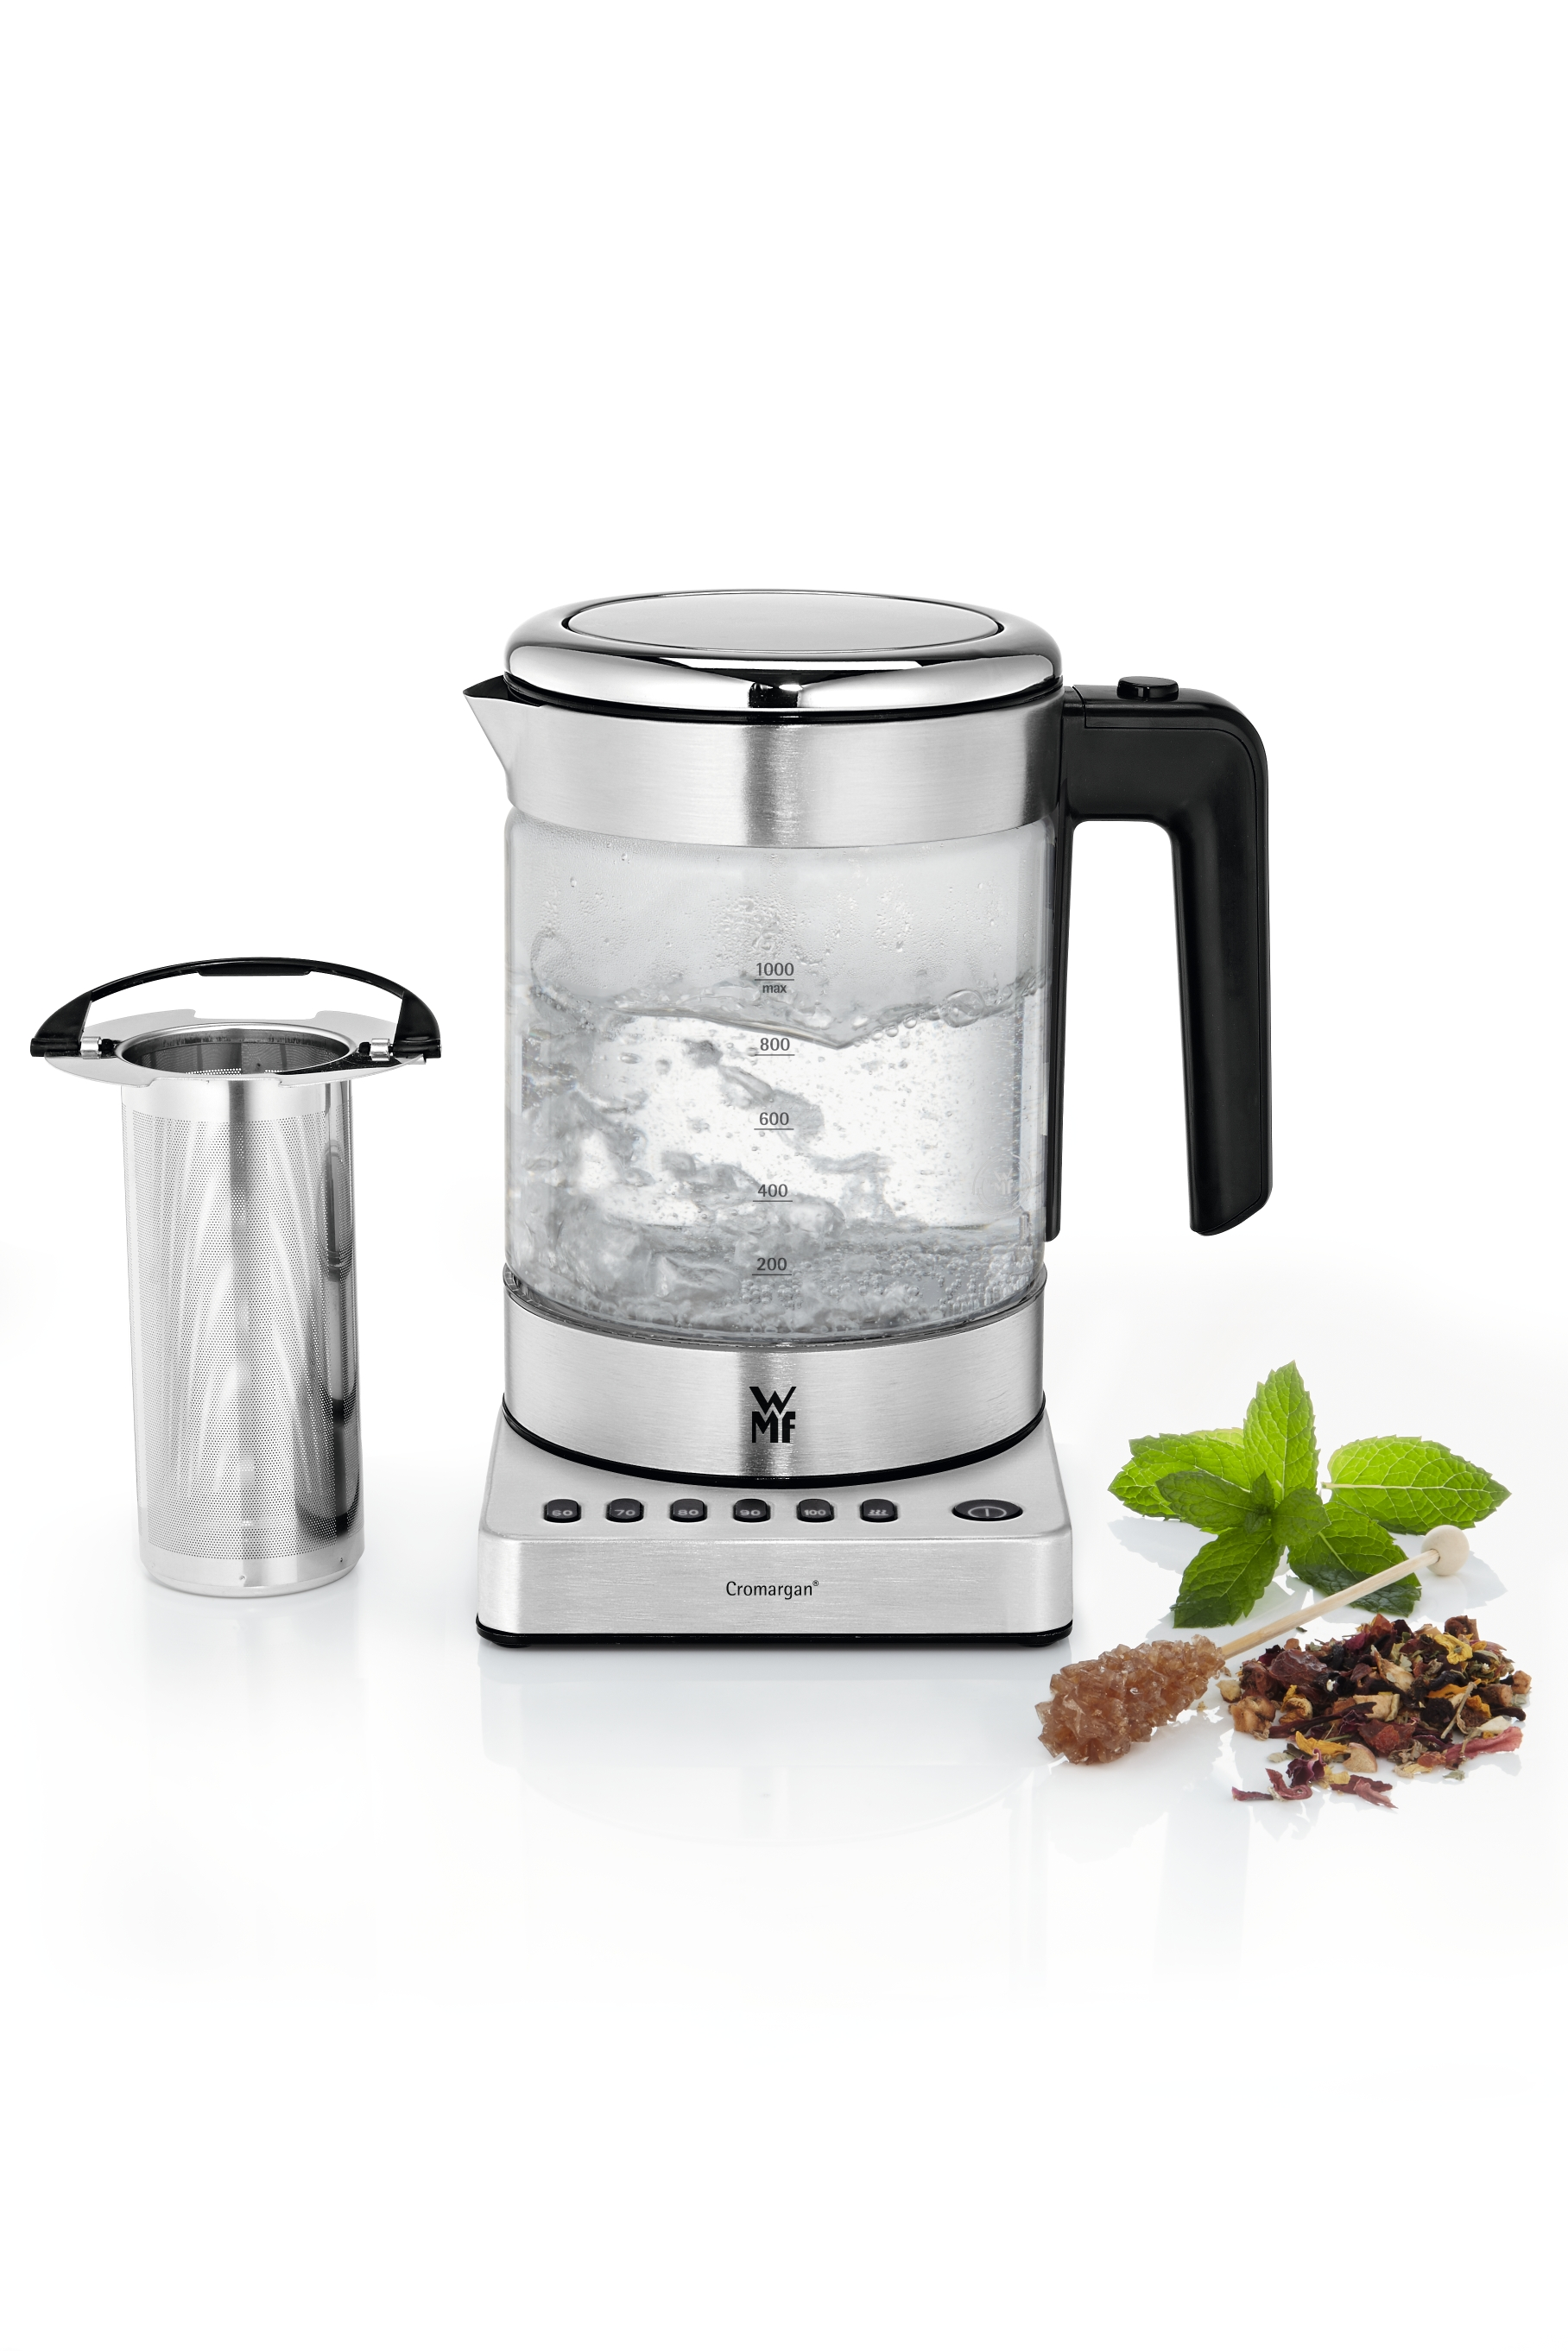 WMF KITCHENminisⓇ Su Isıtıcısı + Çay Makinesi - 1 lt